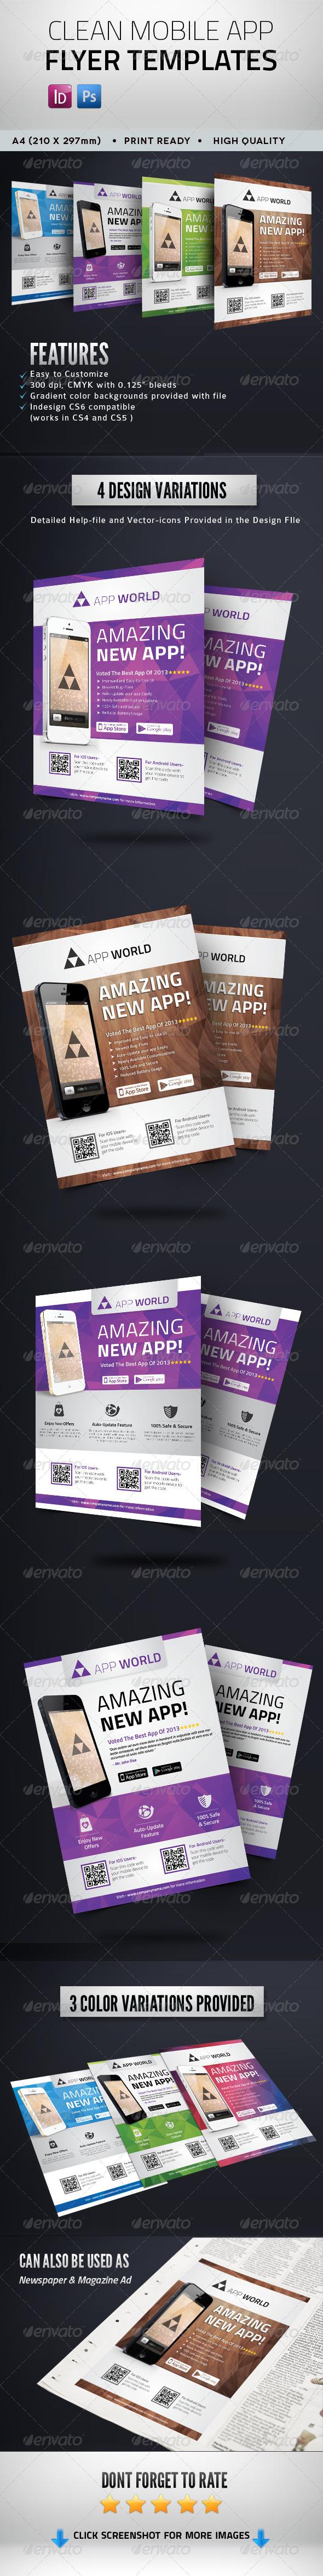 Clean Mobile App Flyer - Commerce Flyers